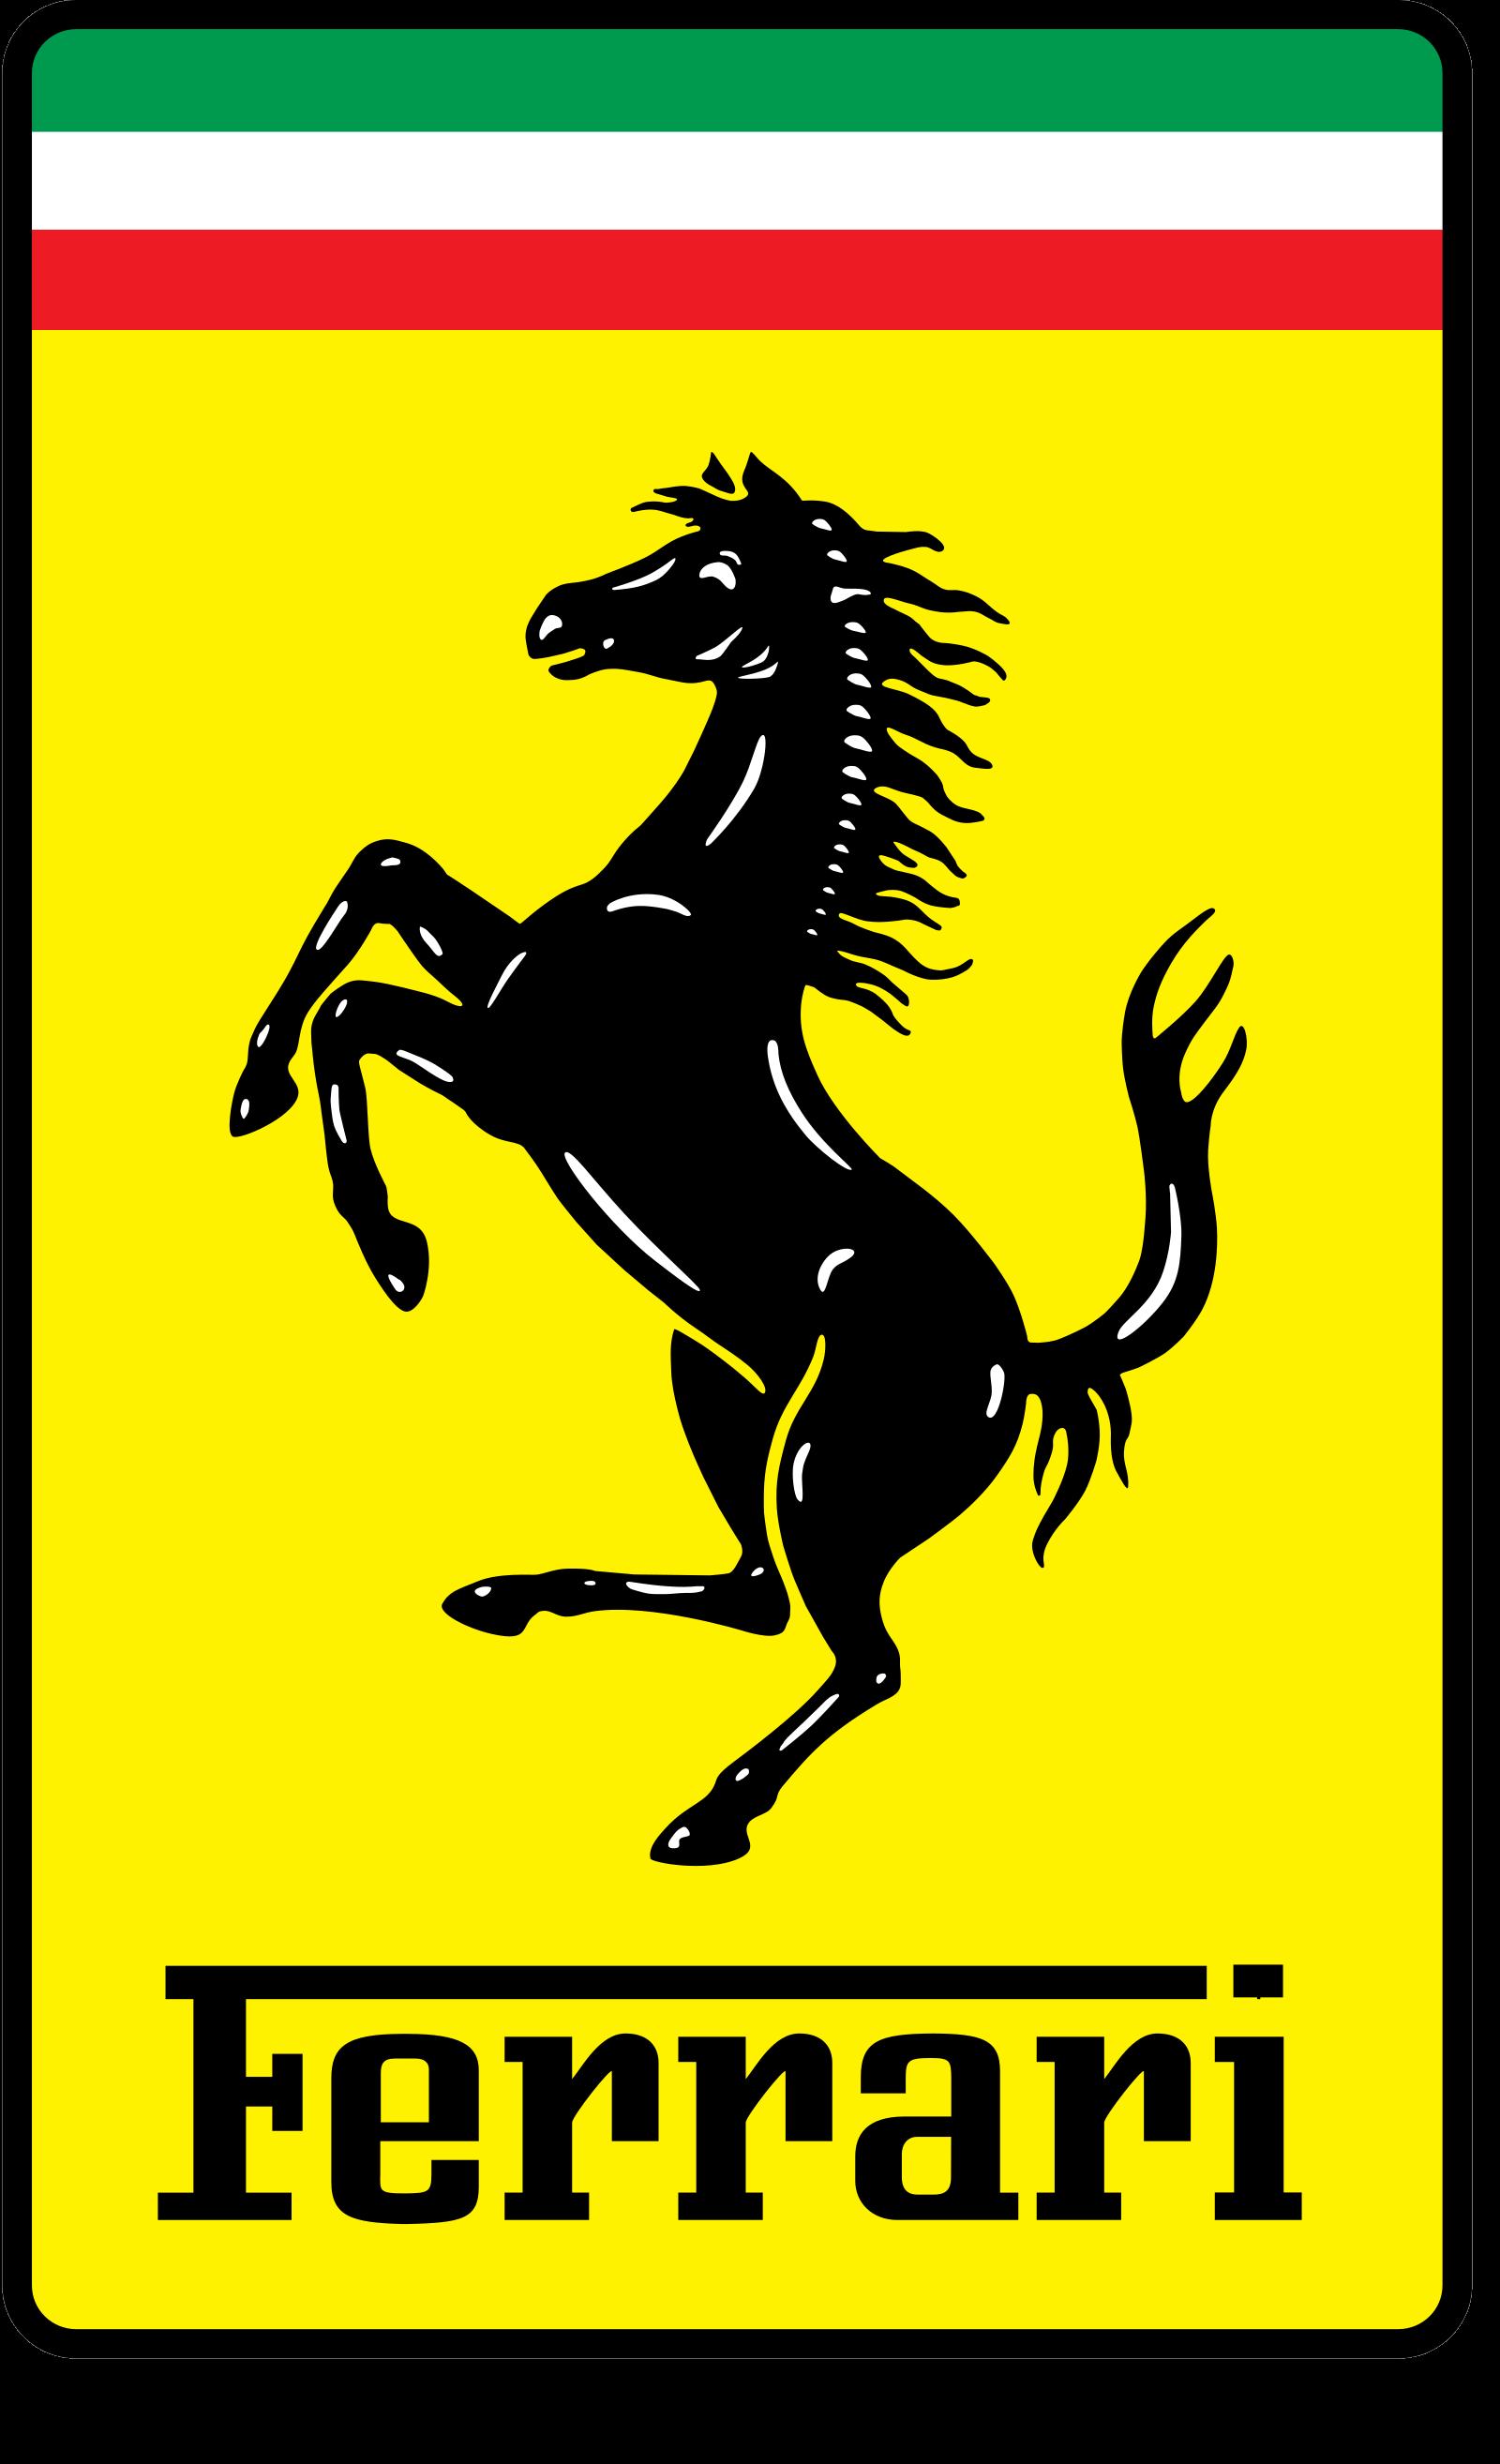 Ferrari Logo Png E Vetor Download De Logo